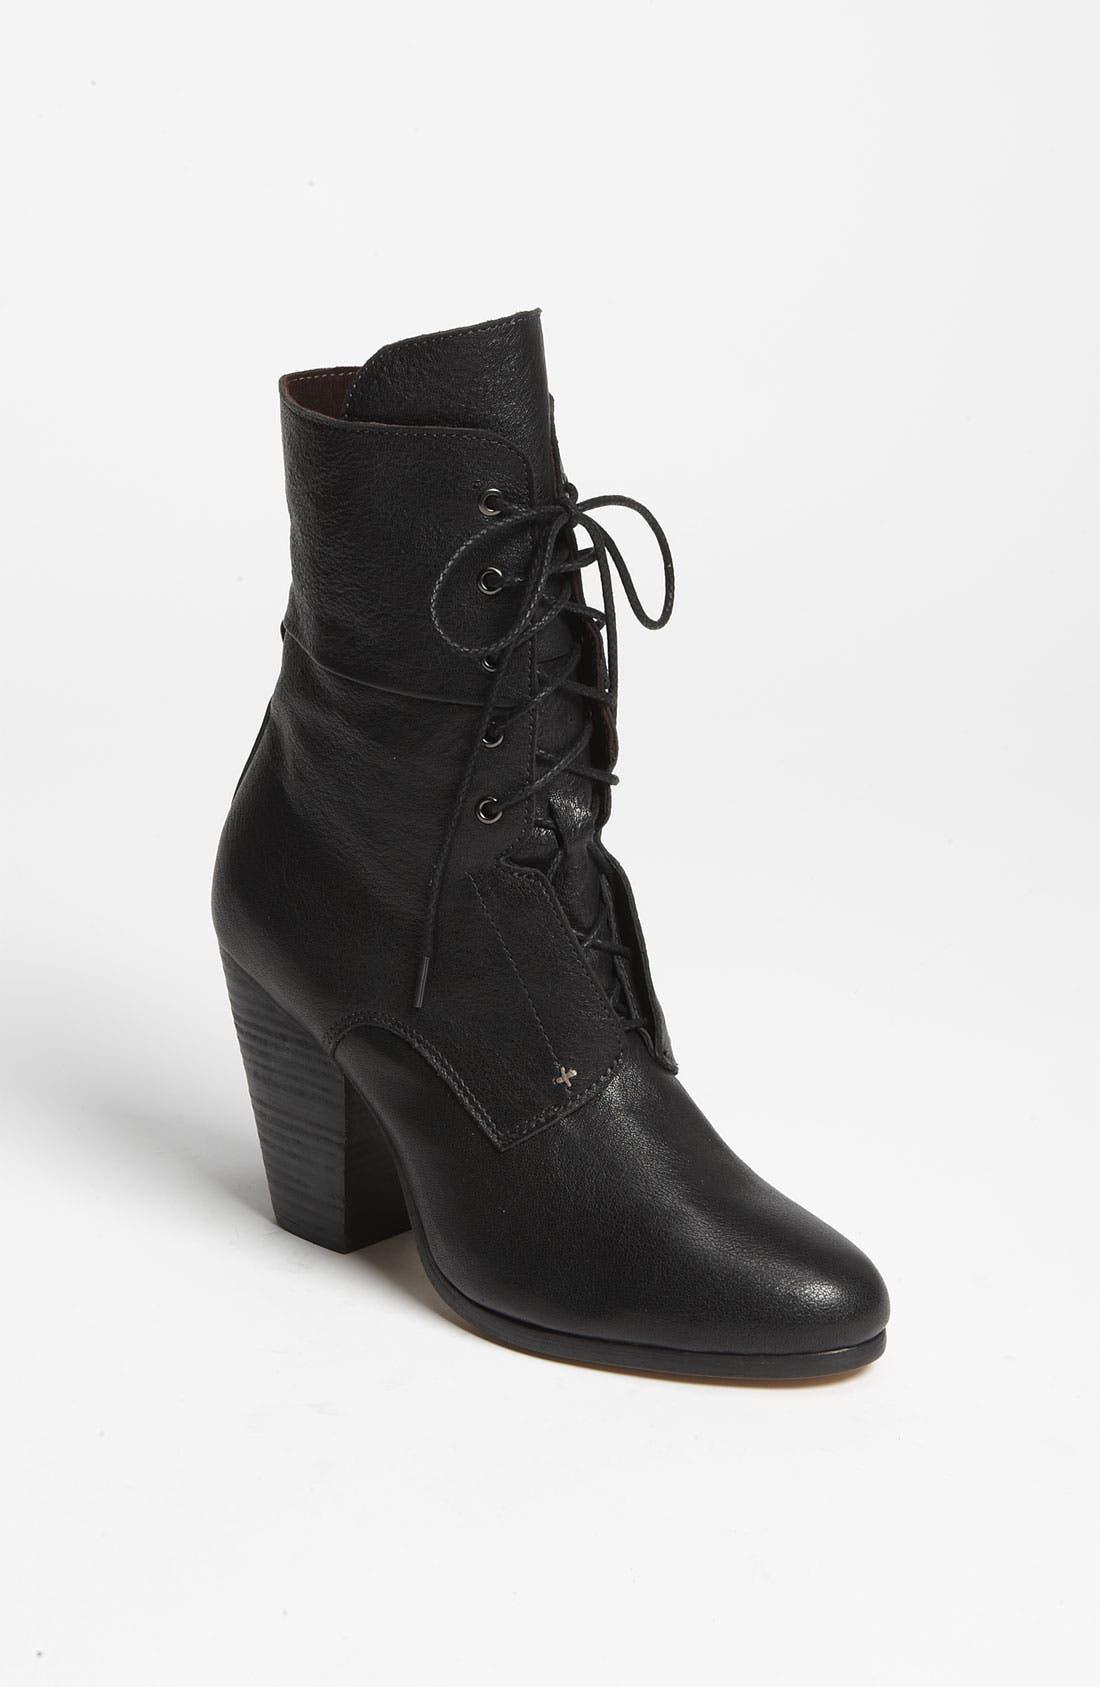 Alternate Image 1 Selected - rag & bone 'Deacon' Boot